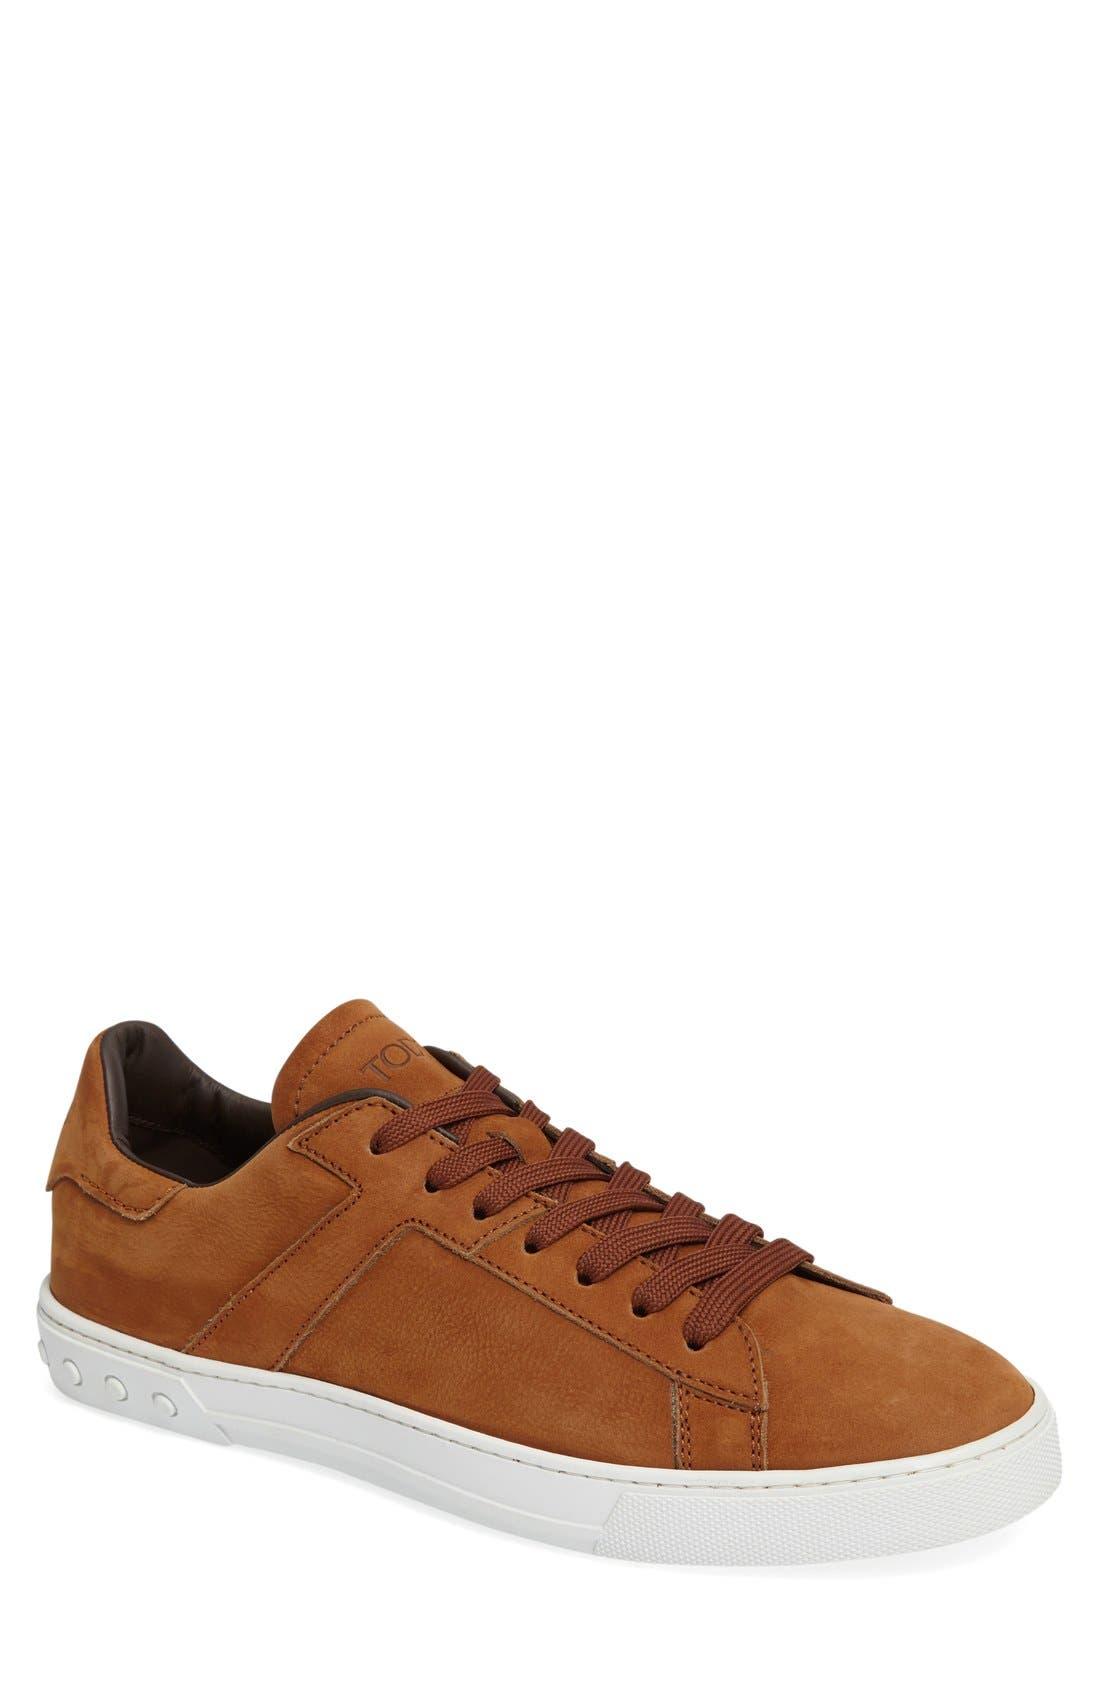 Cassetta Sneaker,                             Main thumbnail 1, color,                             200